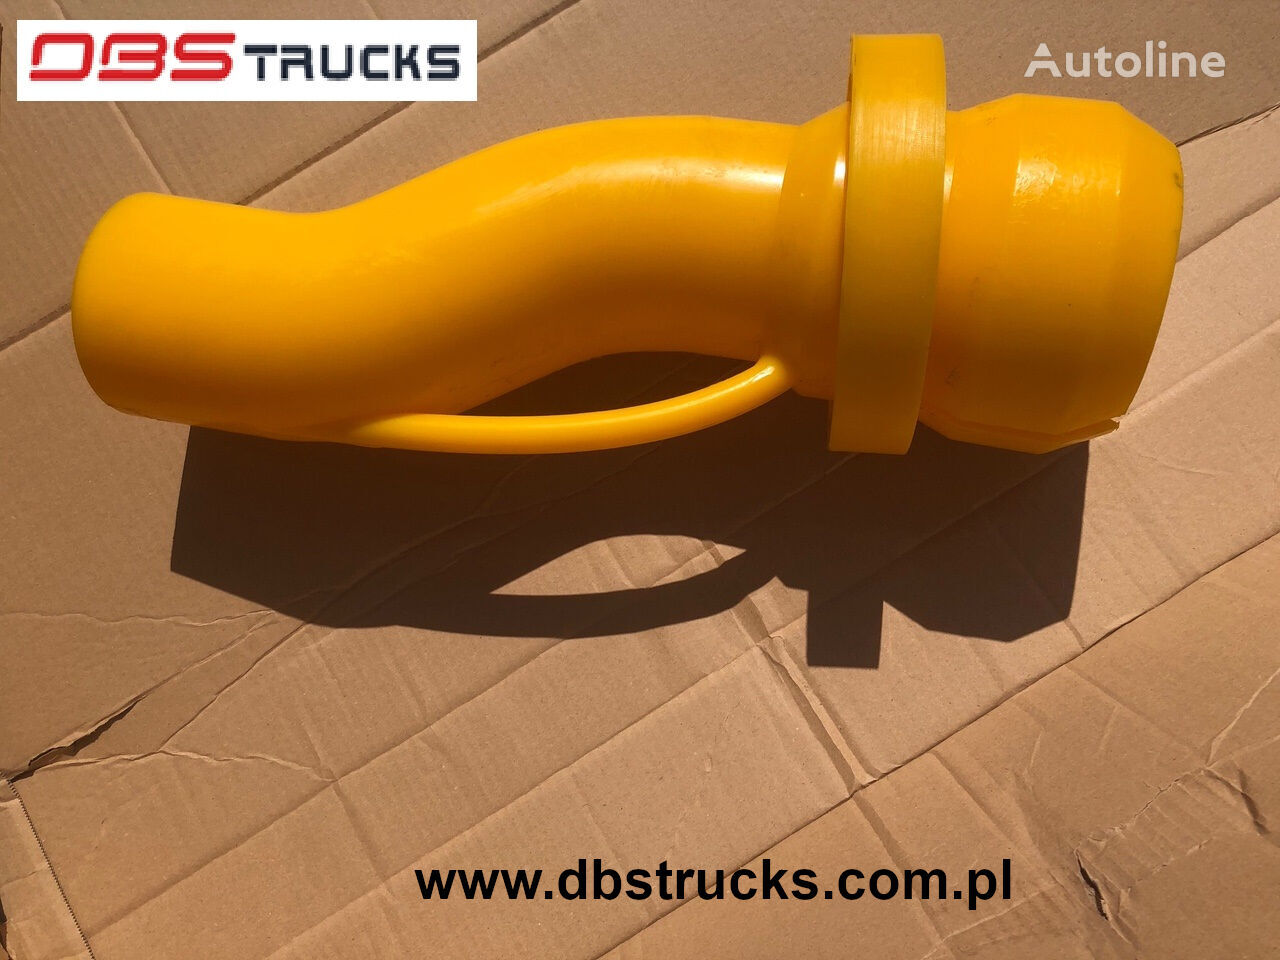 Kolanko spowalniające - poliuretanowe, Brake bend from polyurethane spare parts for automobile